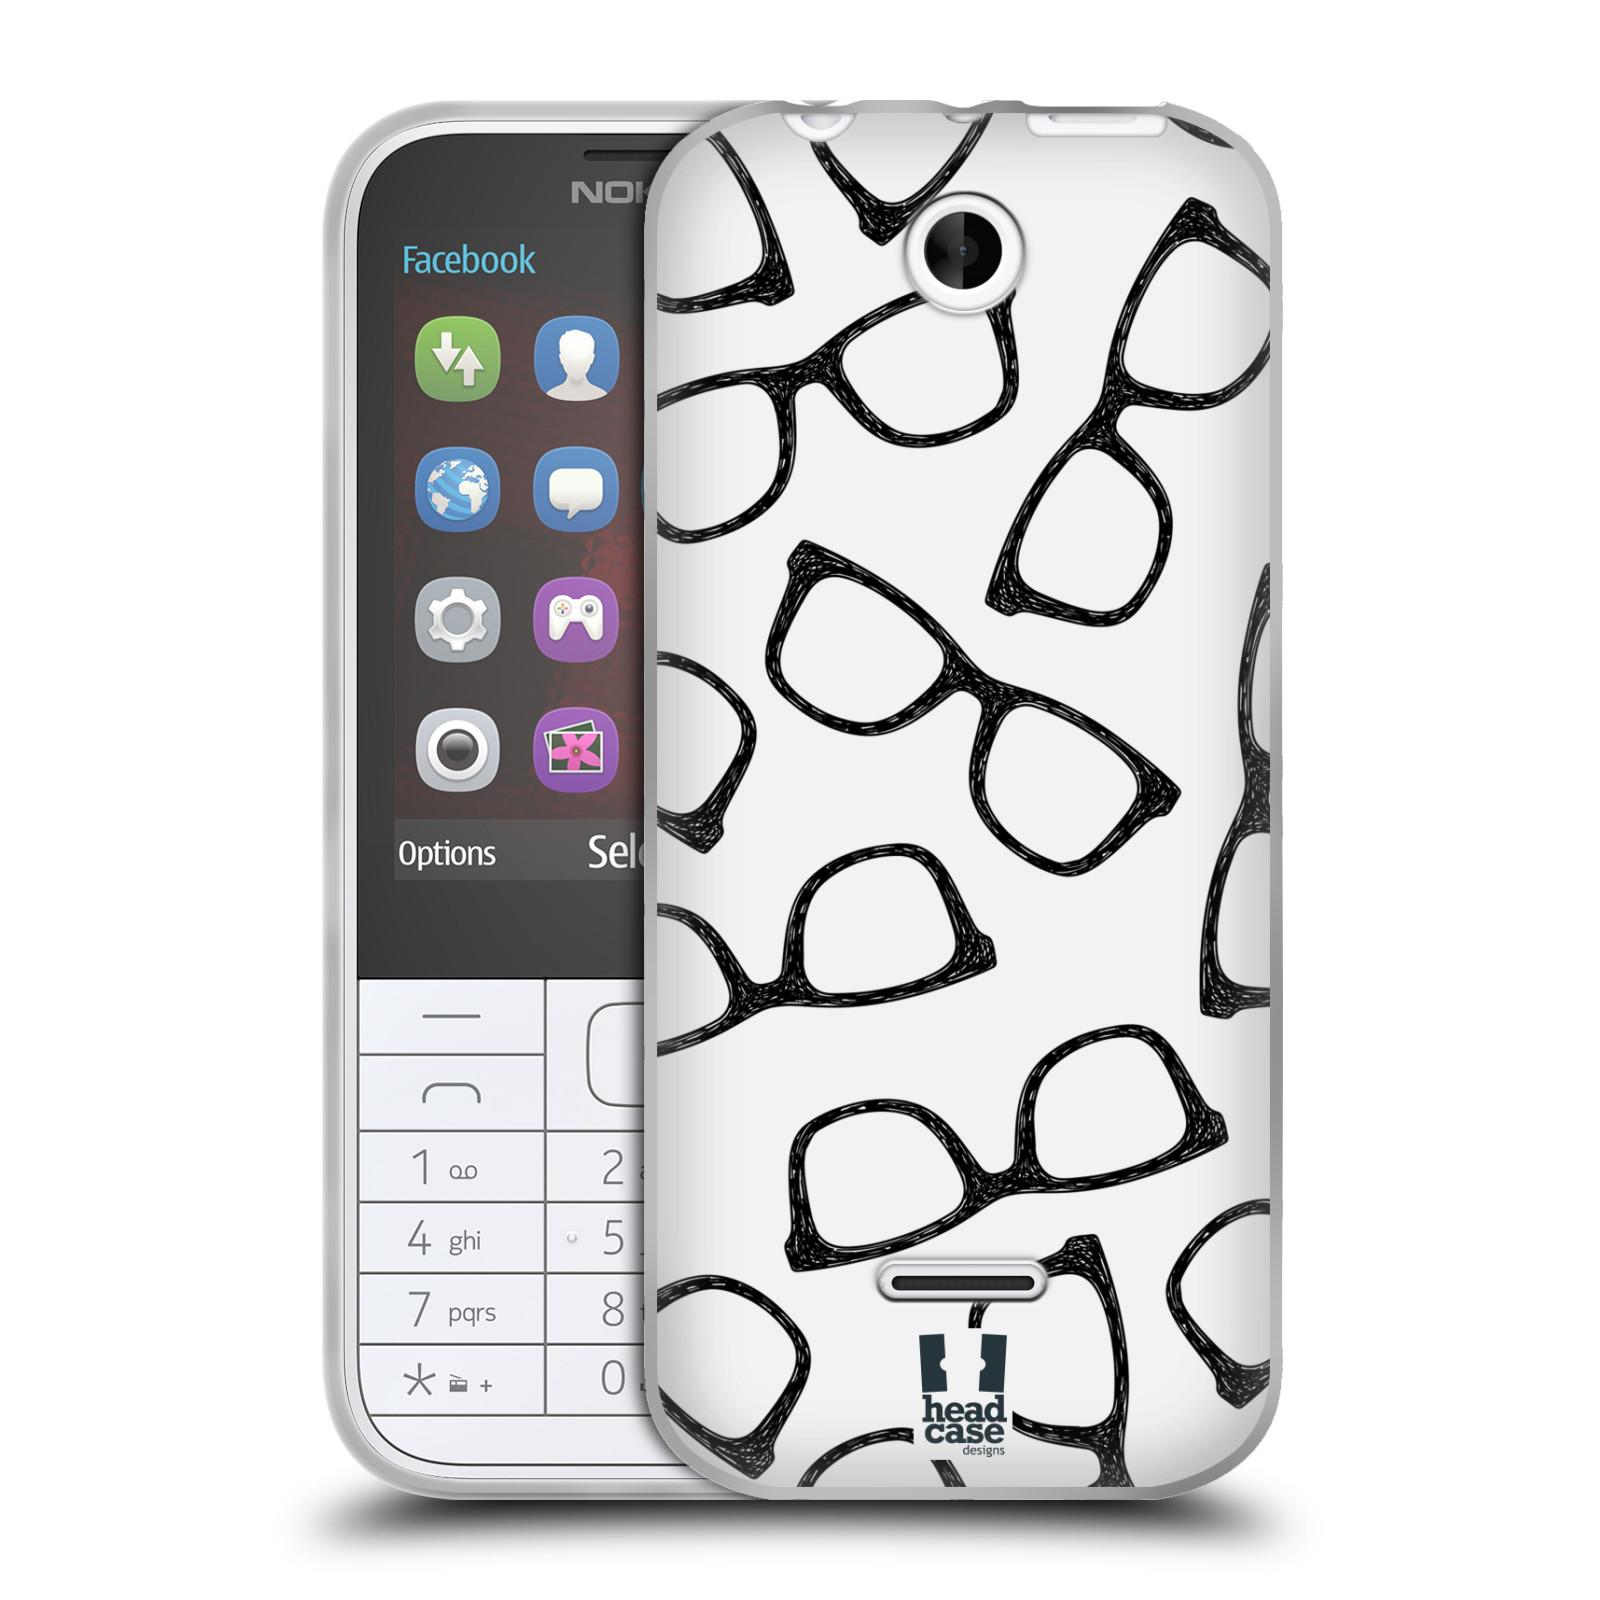 Silikonové pouzdro na mobil Nokia 225 HEAD CASE HIPSTER BRÝLE (Silikonový kryt či obal na mobilní telefon Nokia 225)